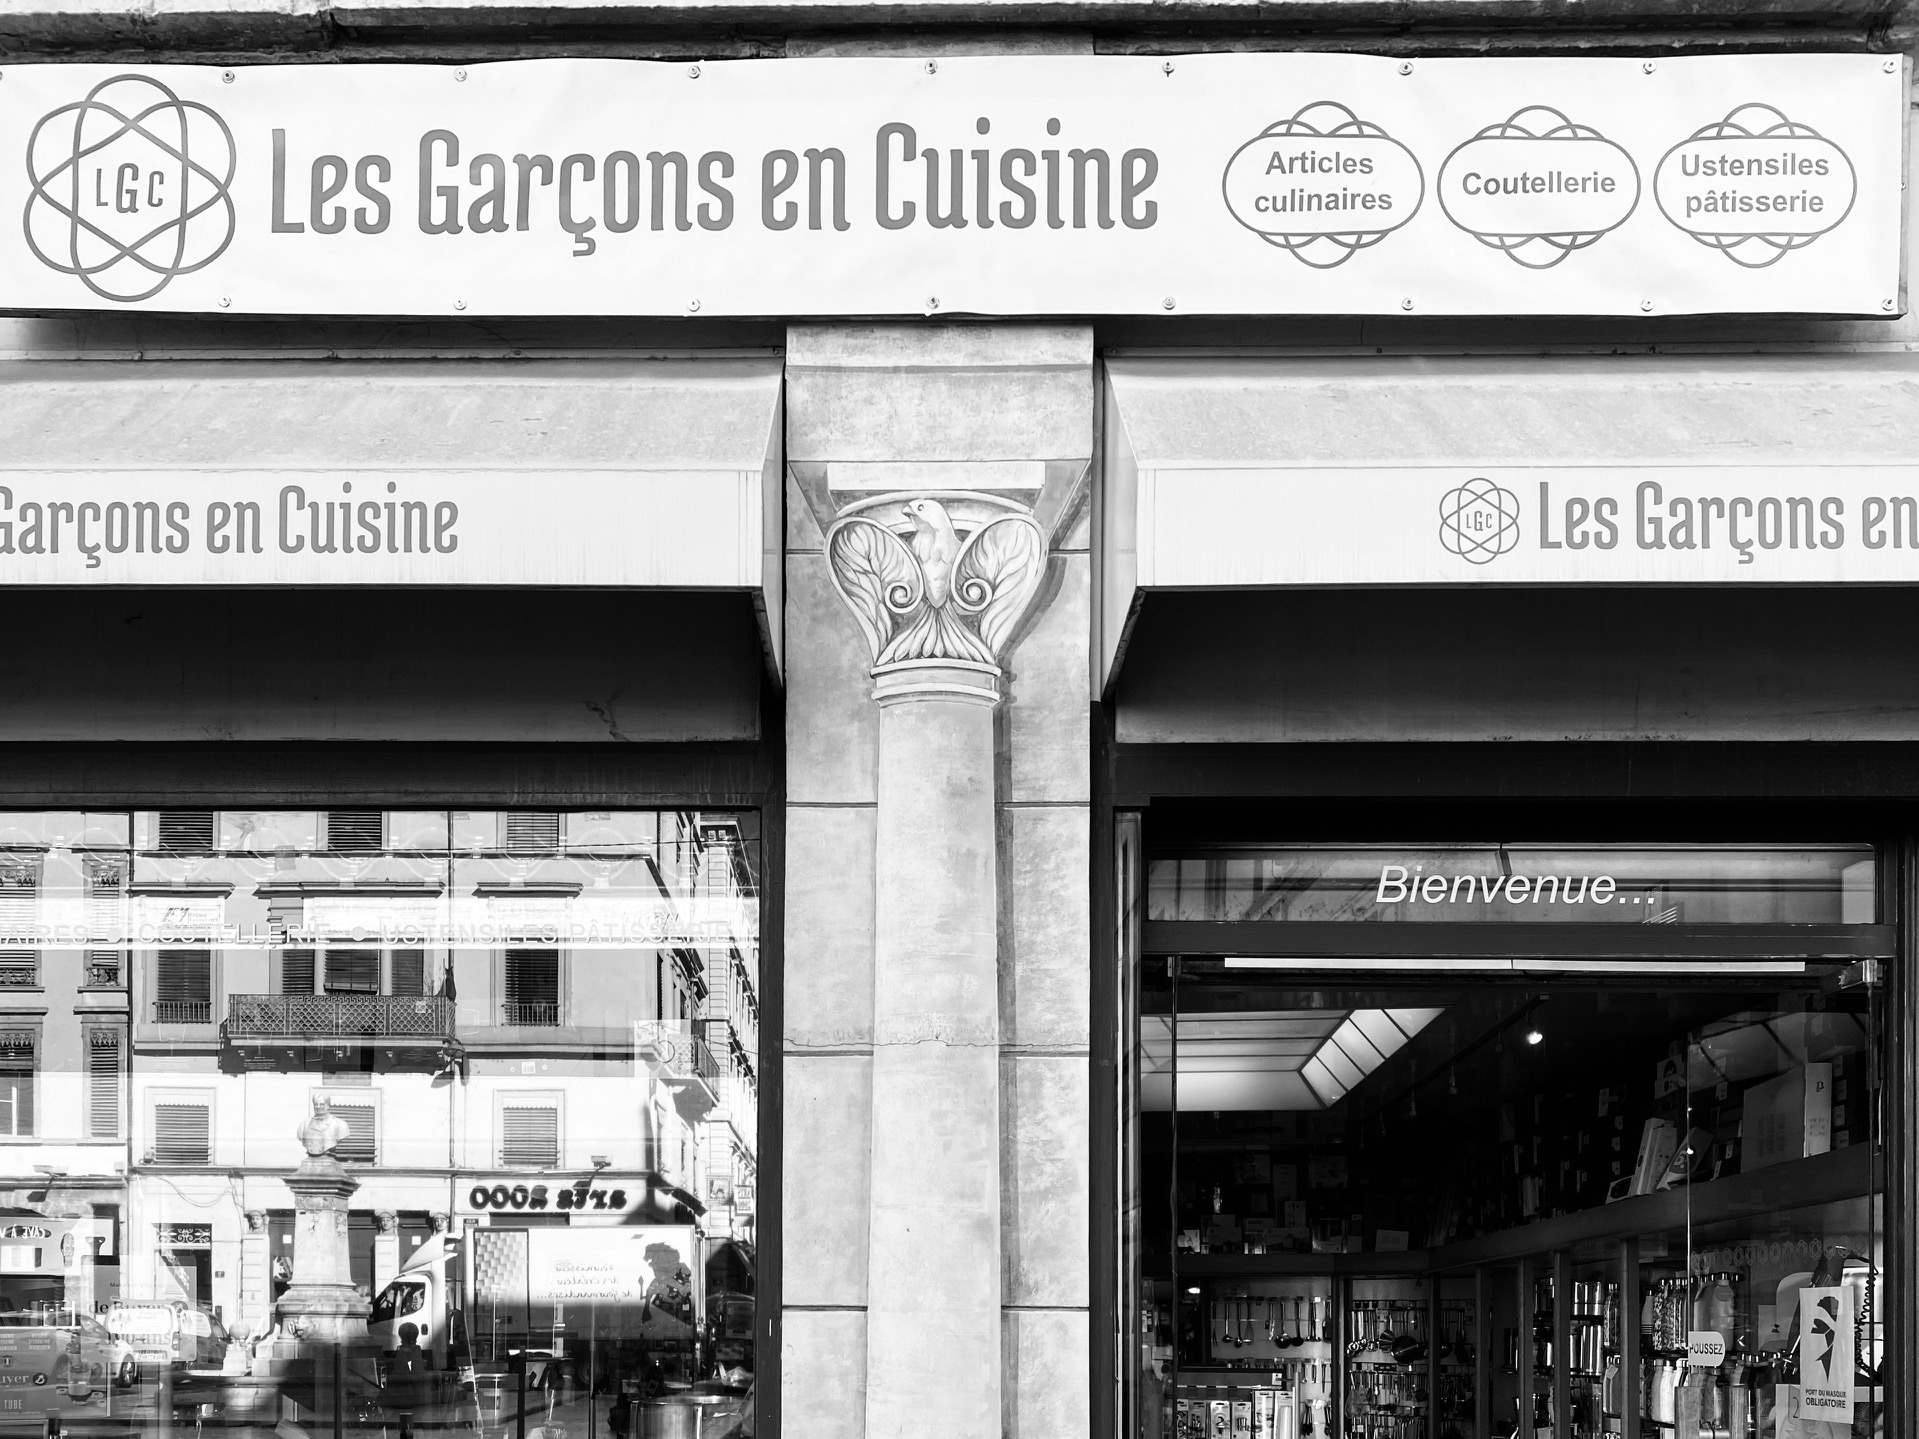 Les Garçons en cuisine Lyon vitrine